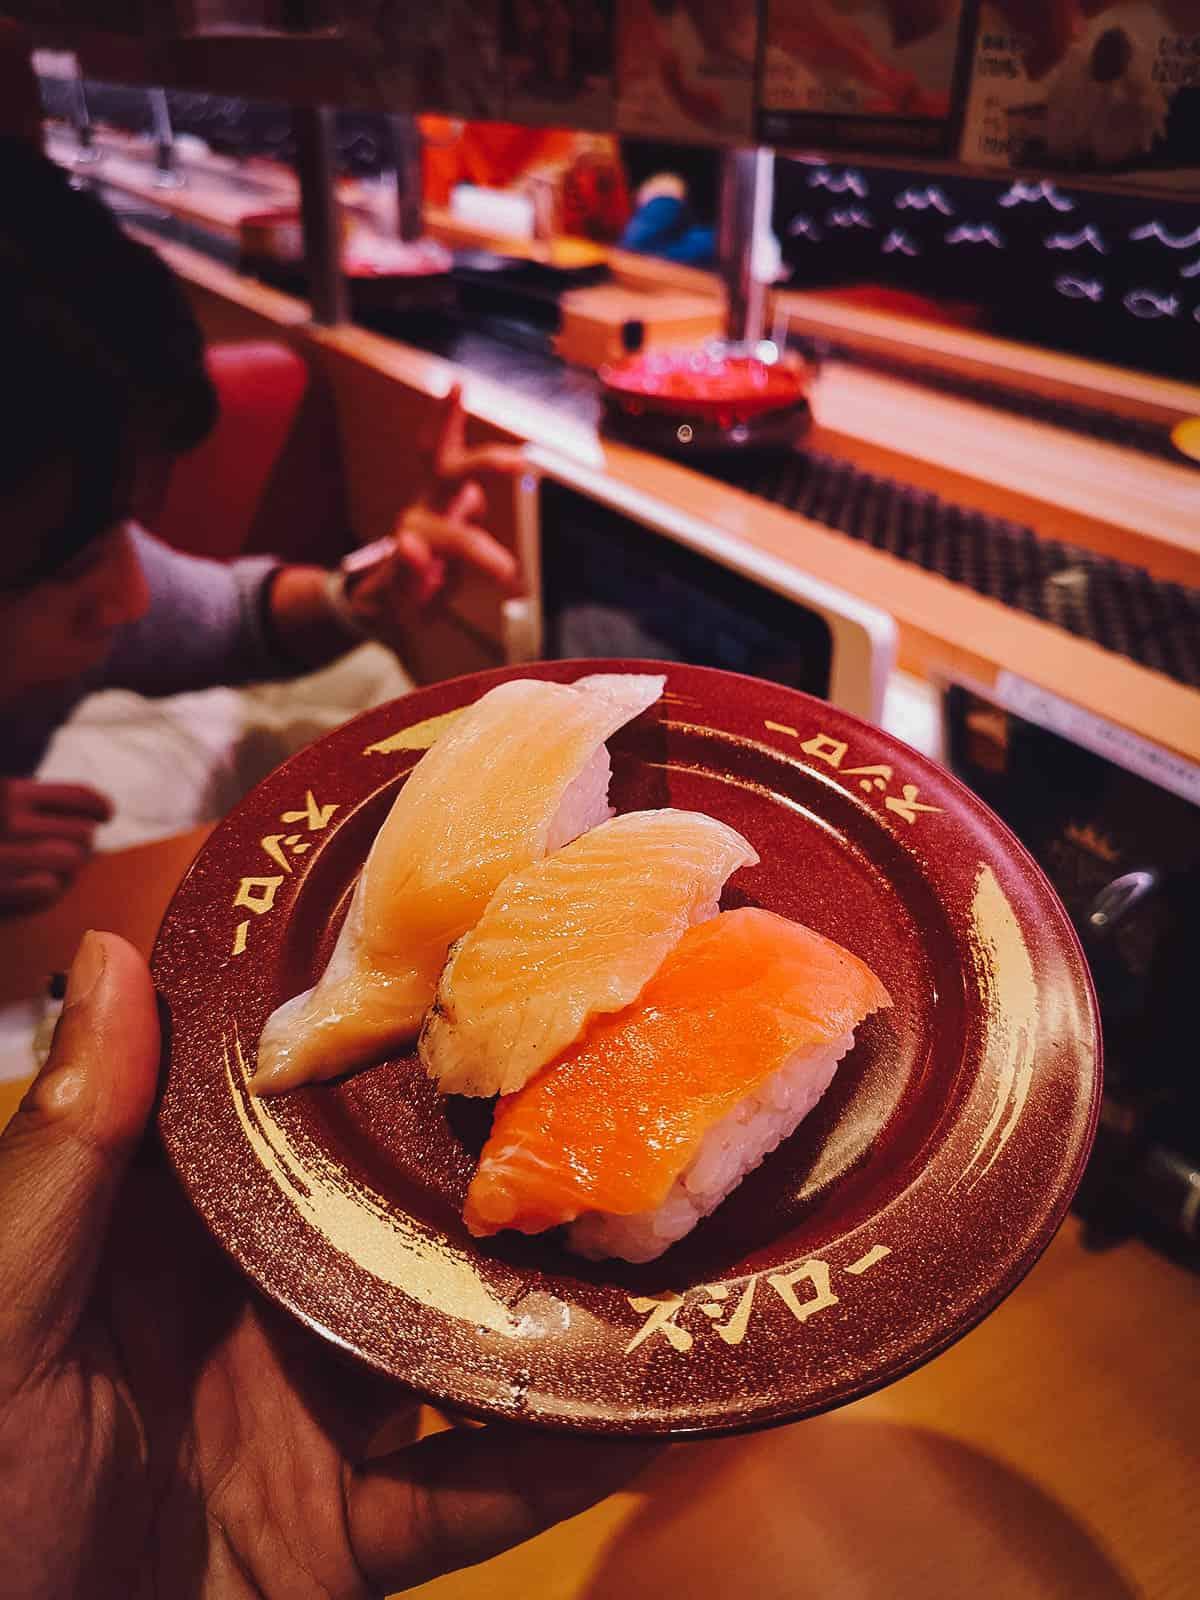 Sushi at Sushiro in Tokyo, Japan